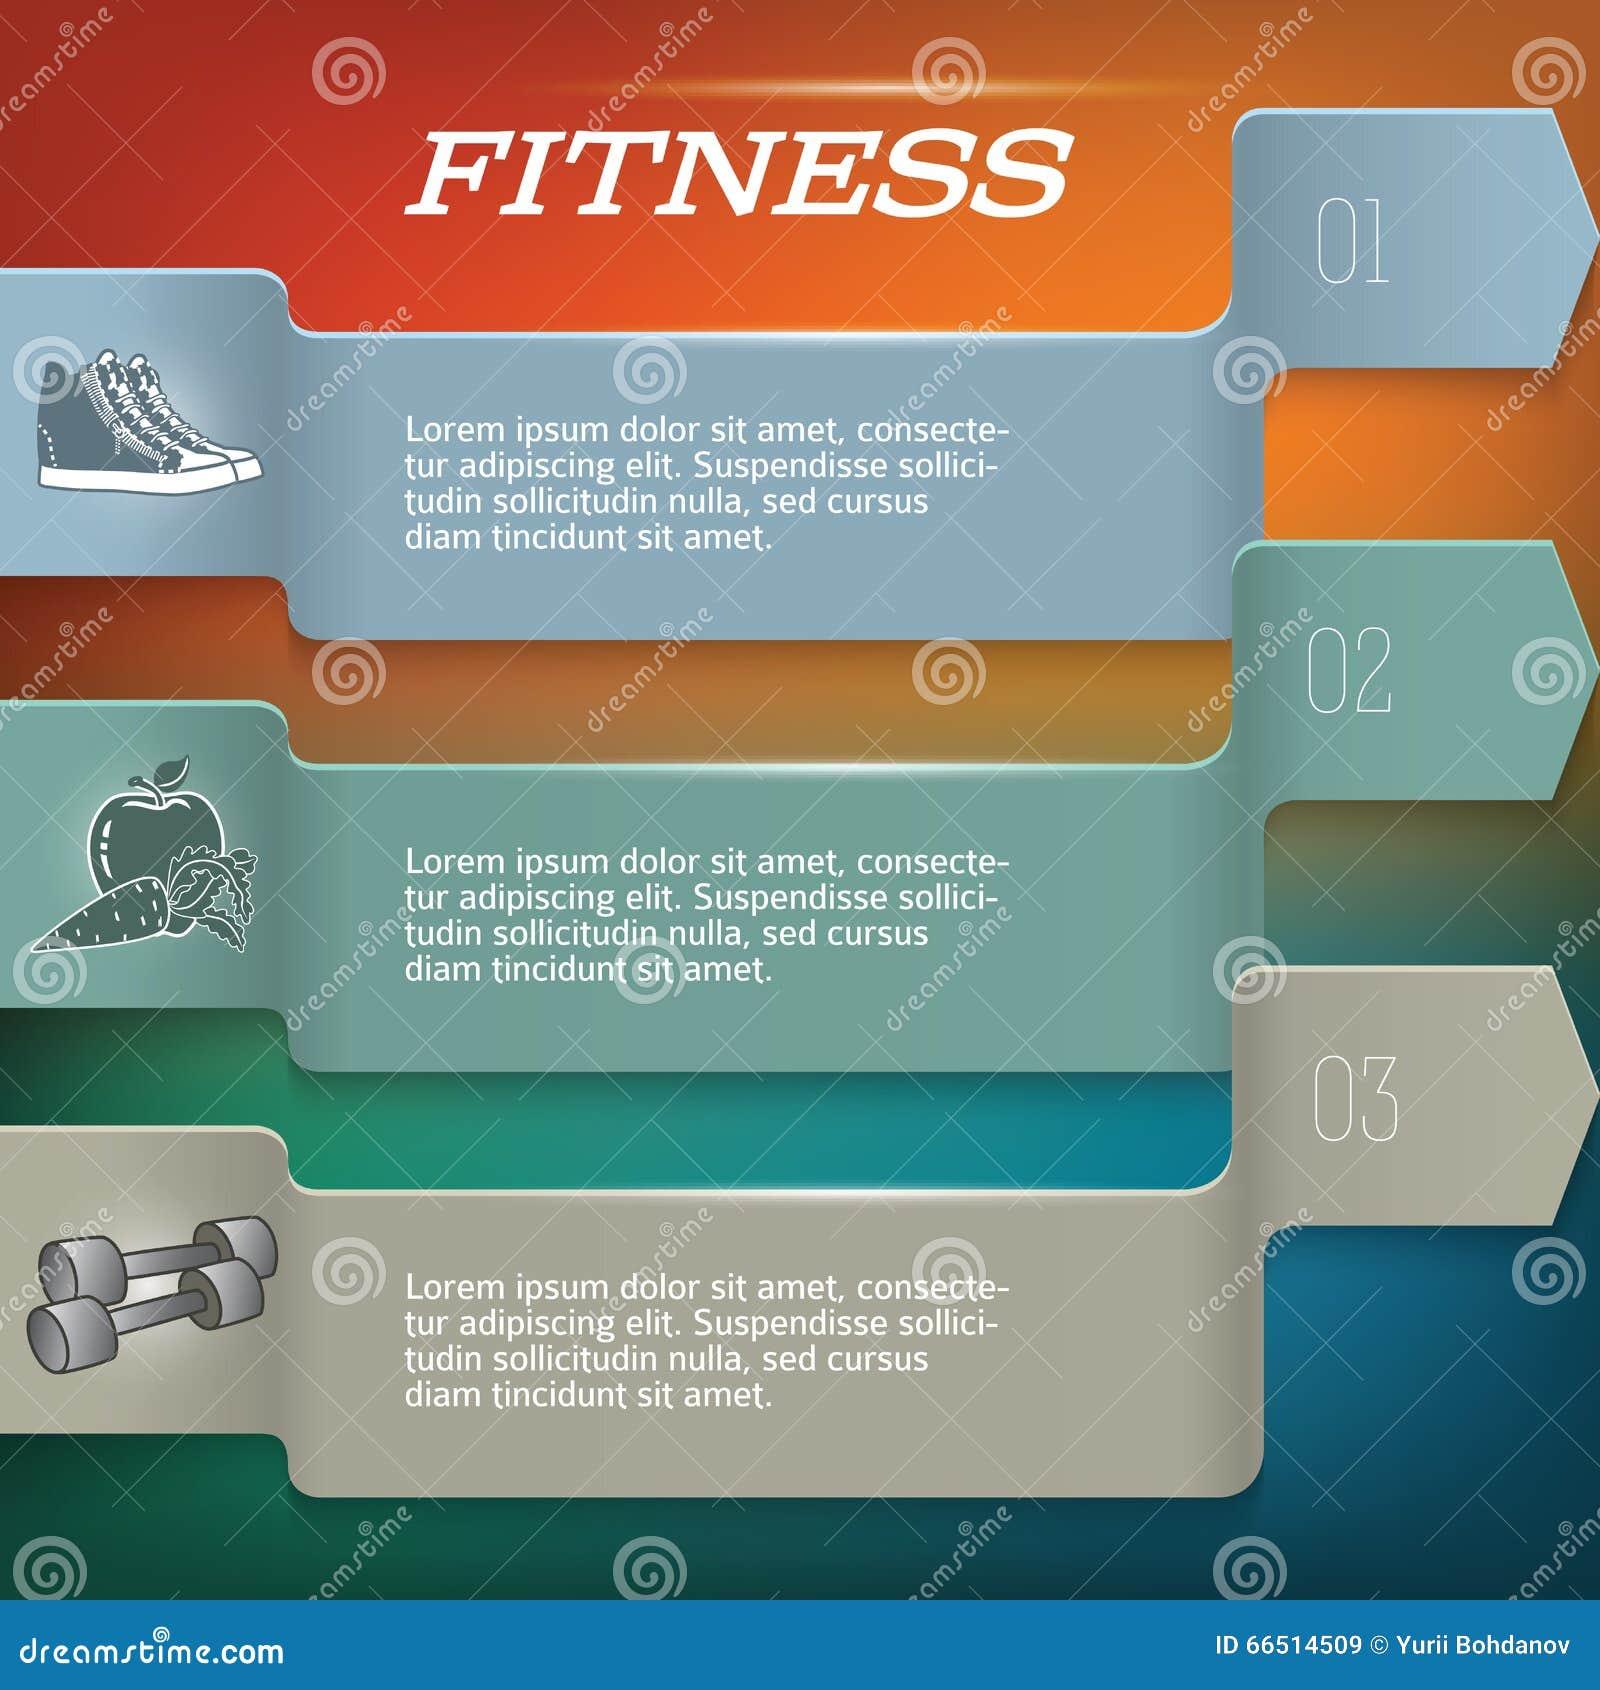 Fitnesssbackgrouptemplatepagenewsletter Stock Illustration - Training newsletter template